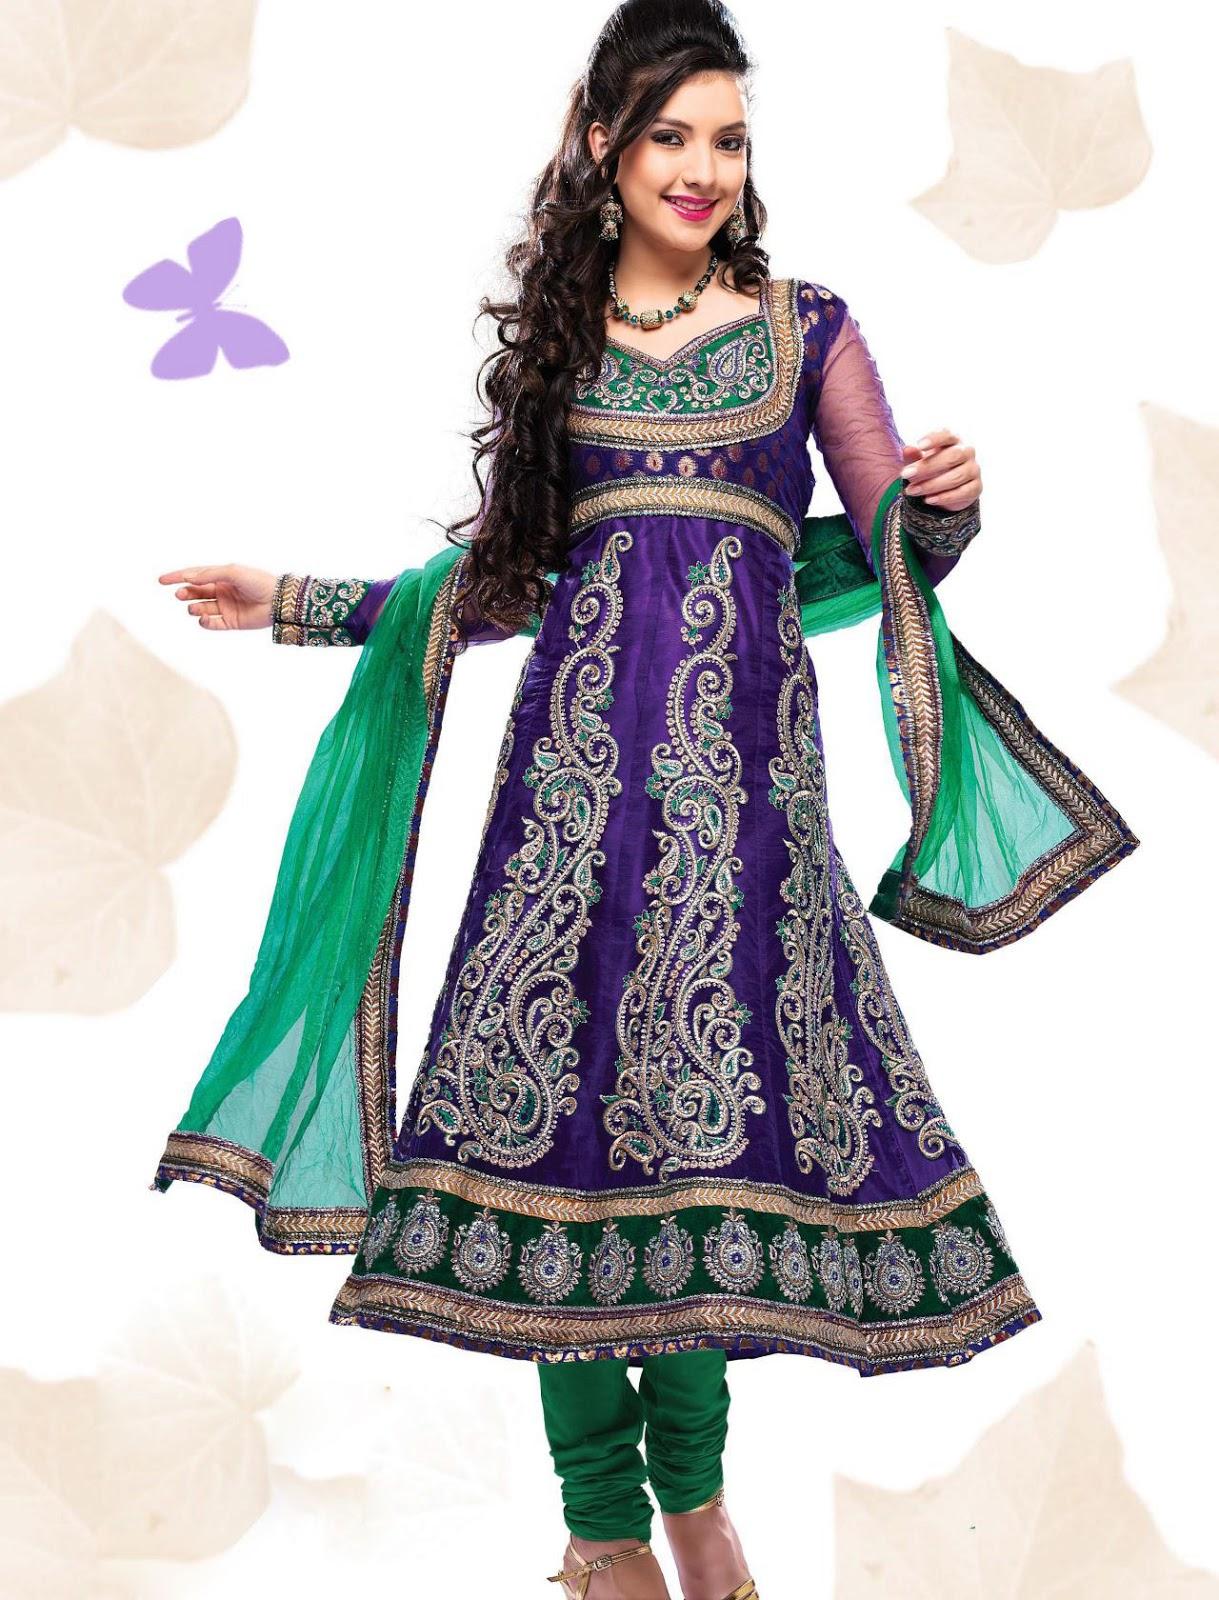 Birthday Baby in Benaras Lehenga - Indian Dresses